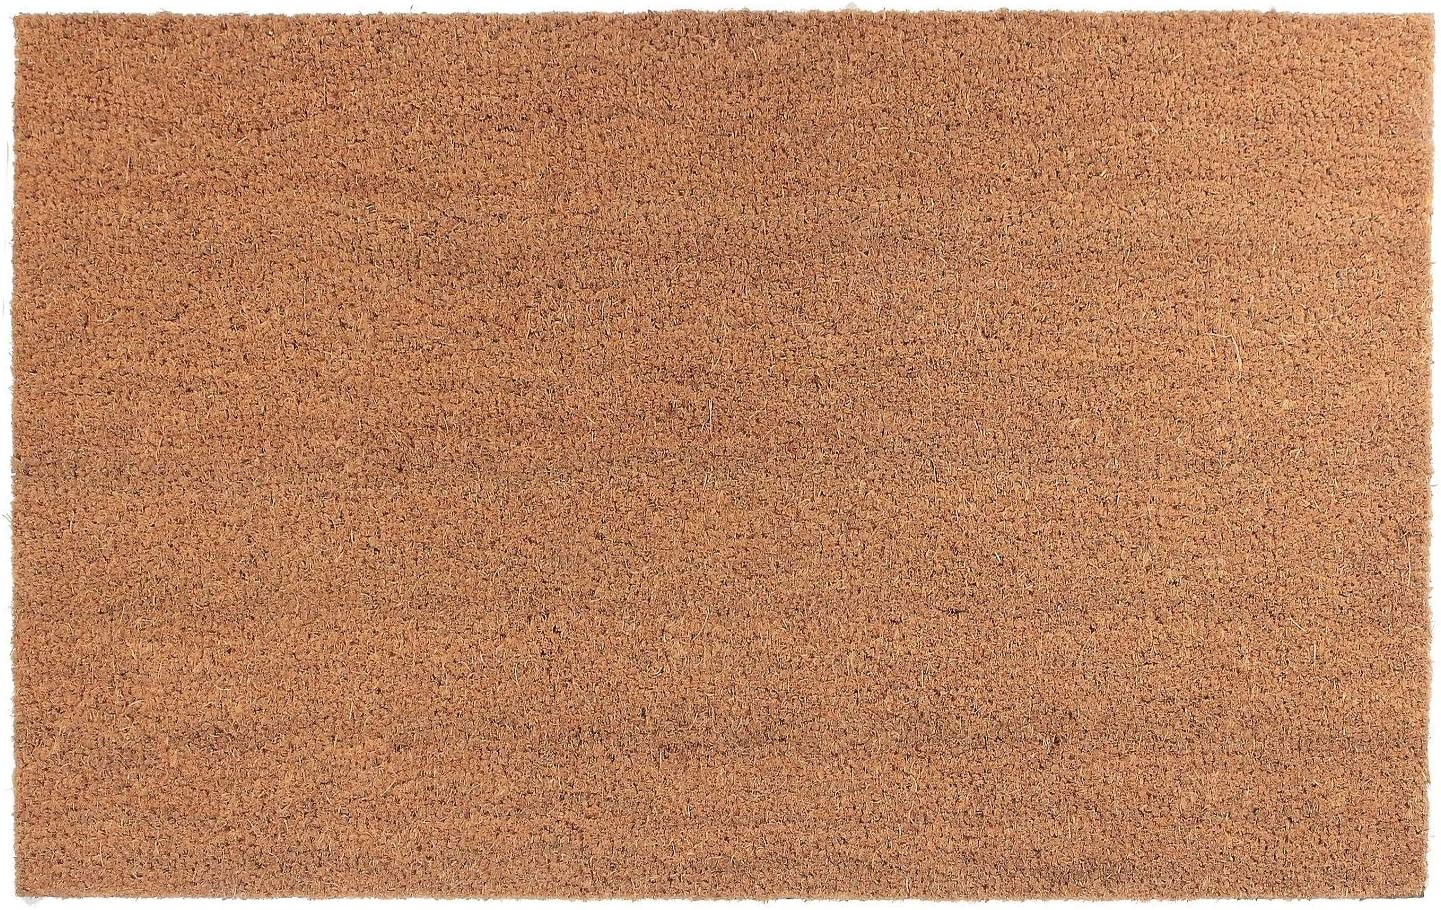 Plain Coir Doormat 18 x 30